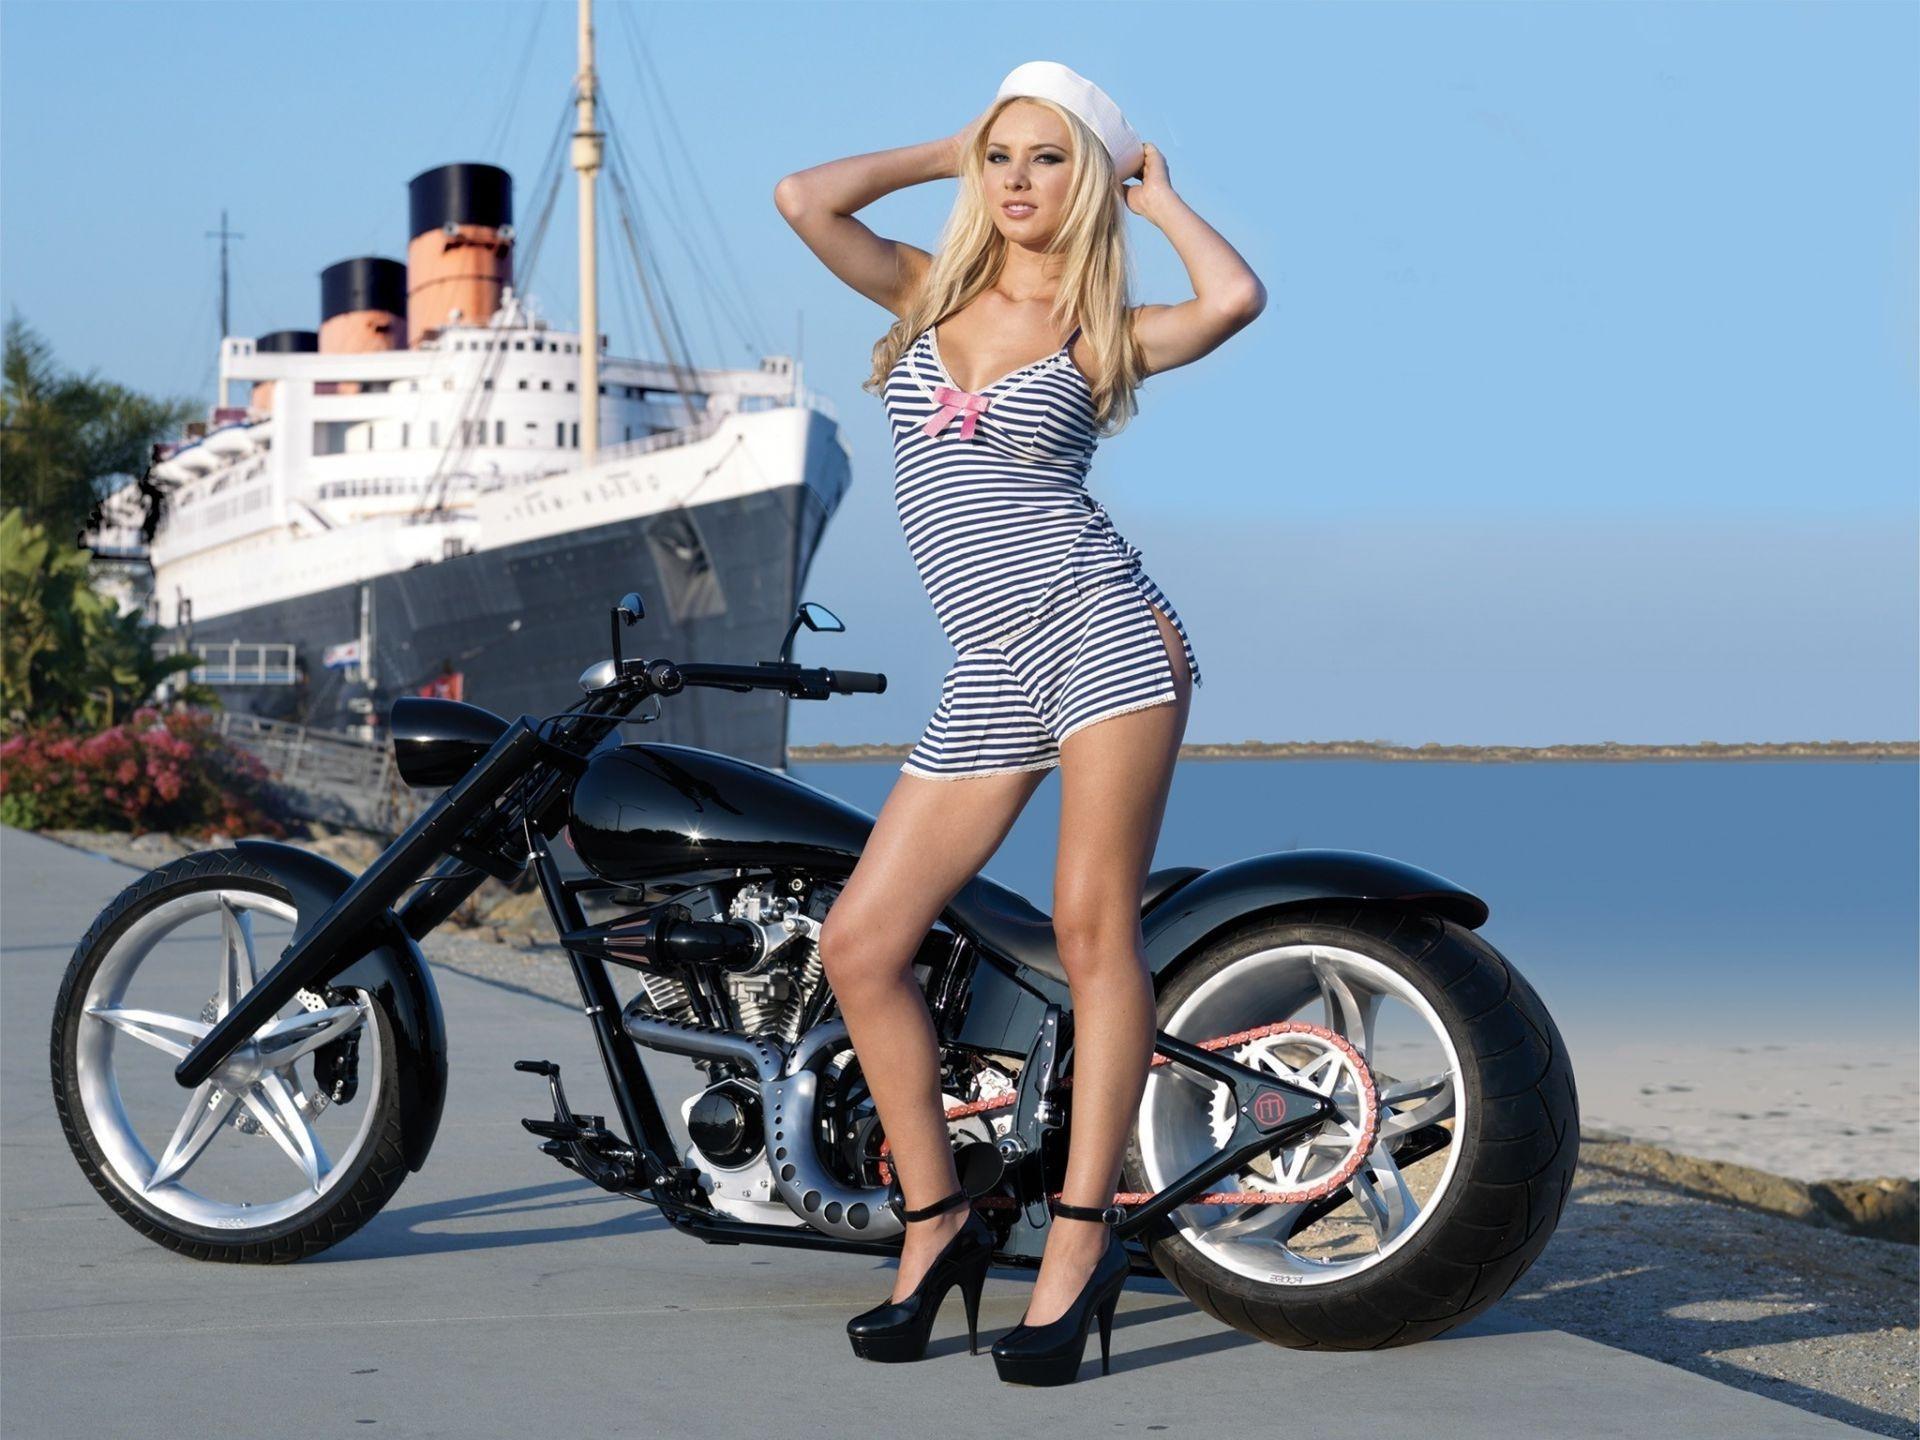 Bikes with hot girls, girl fuck bars cop